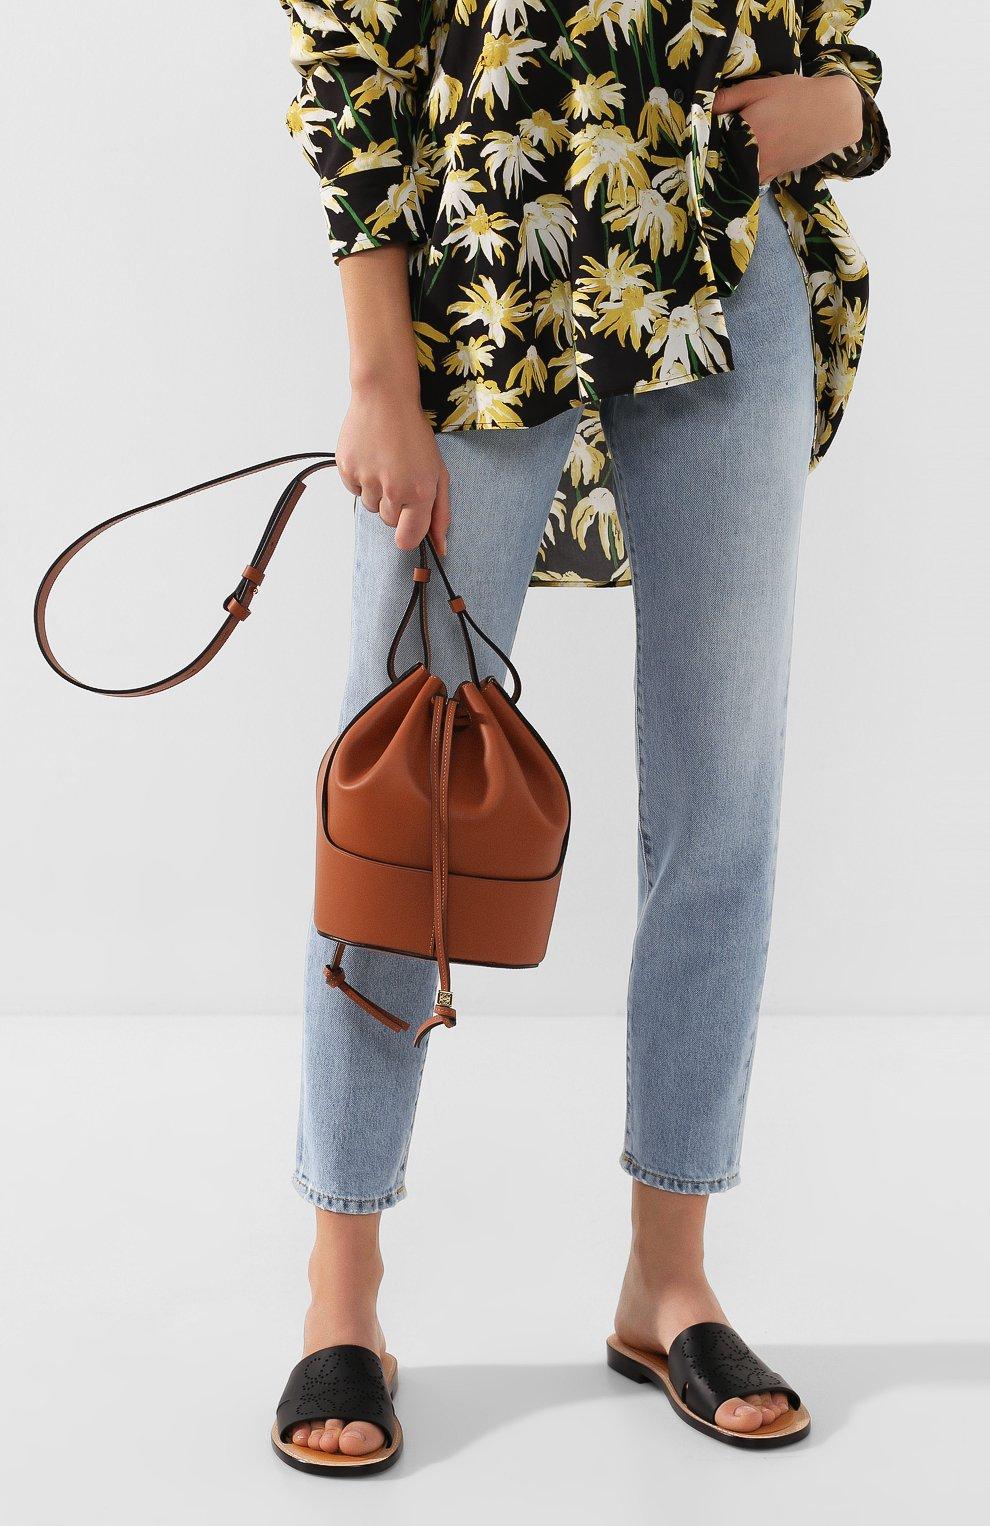 Женская сумка balloon small LOEWE светло-коричневого цвета, арт. 326.75AC31   Фото 2 (Сумки-технические: Сумки через плечо; Материал: Натуральная кожа; Ремень/цепочка: На ремешке; Размер: small)